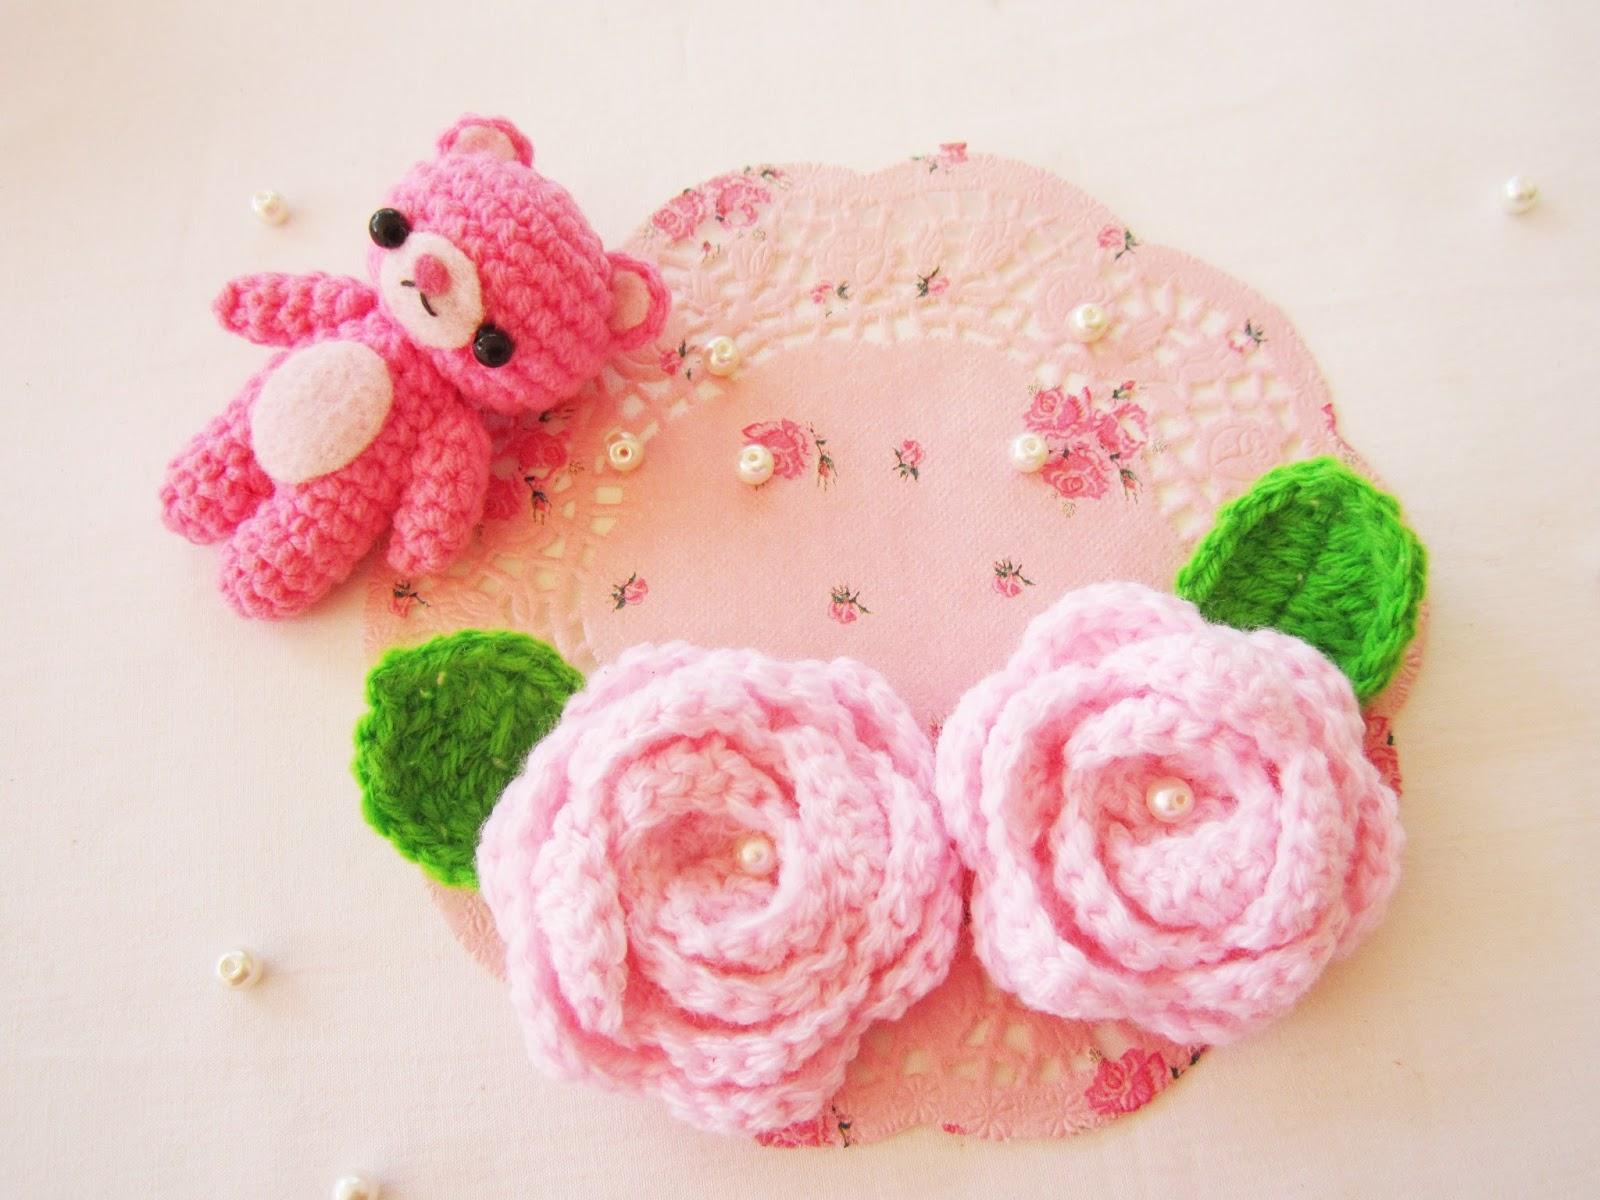 Crochet roses - A little love everyday!